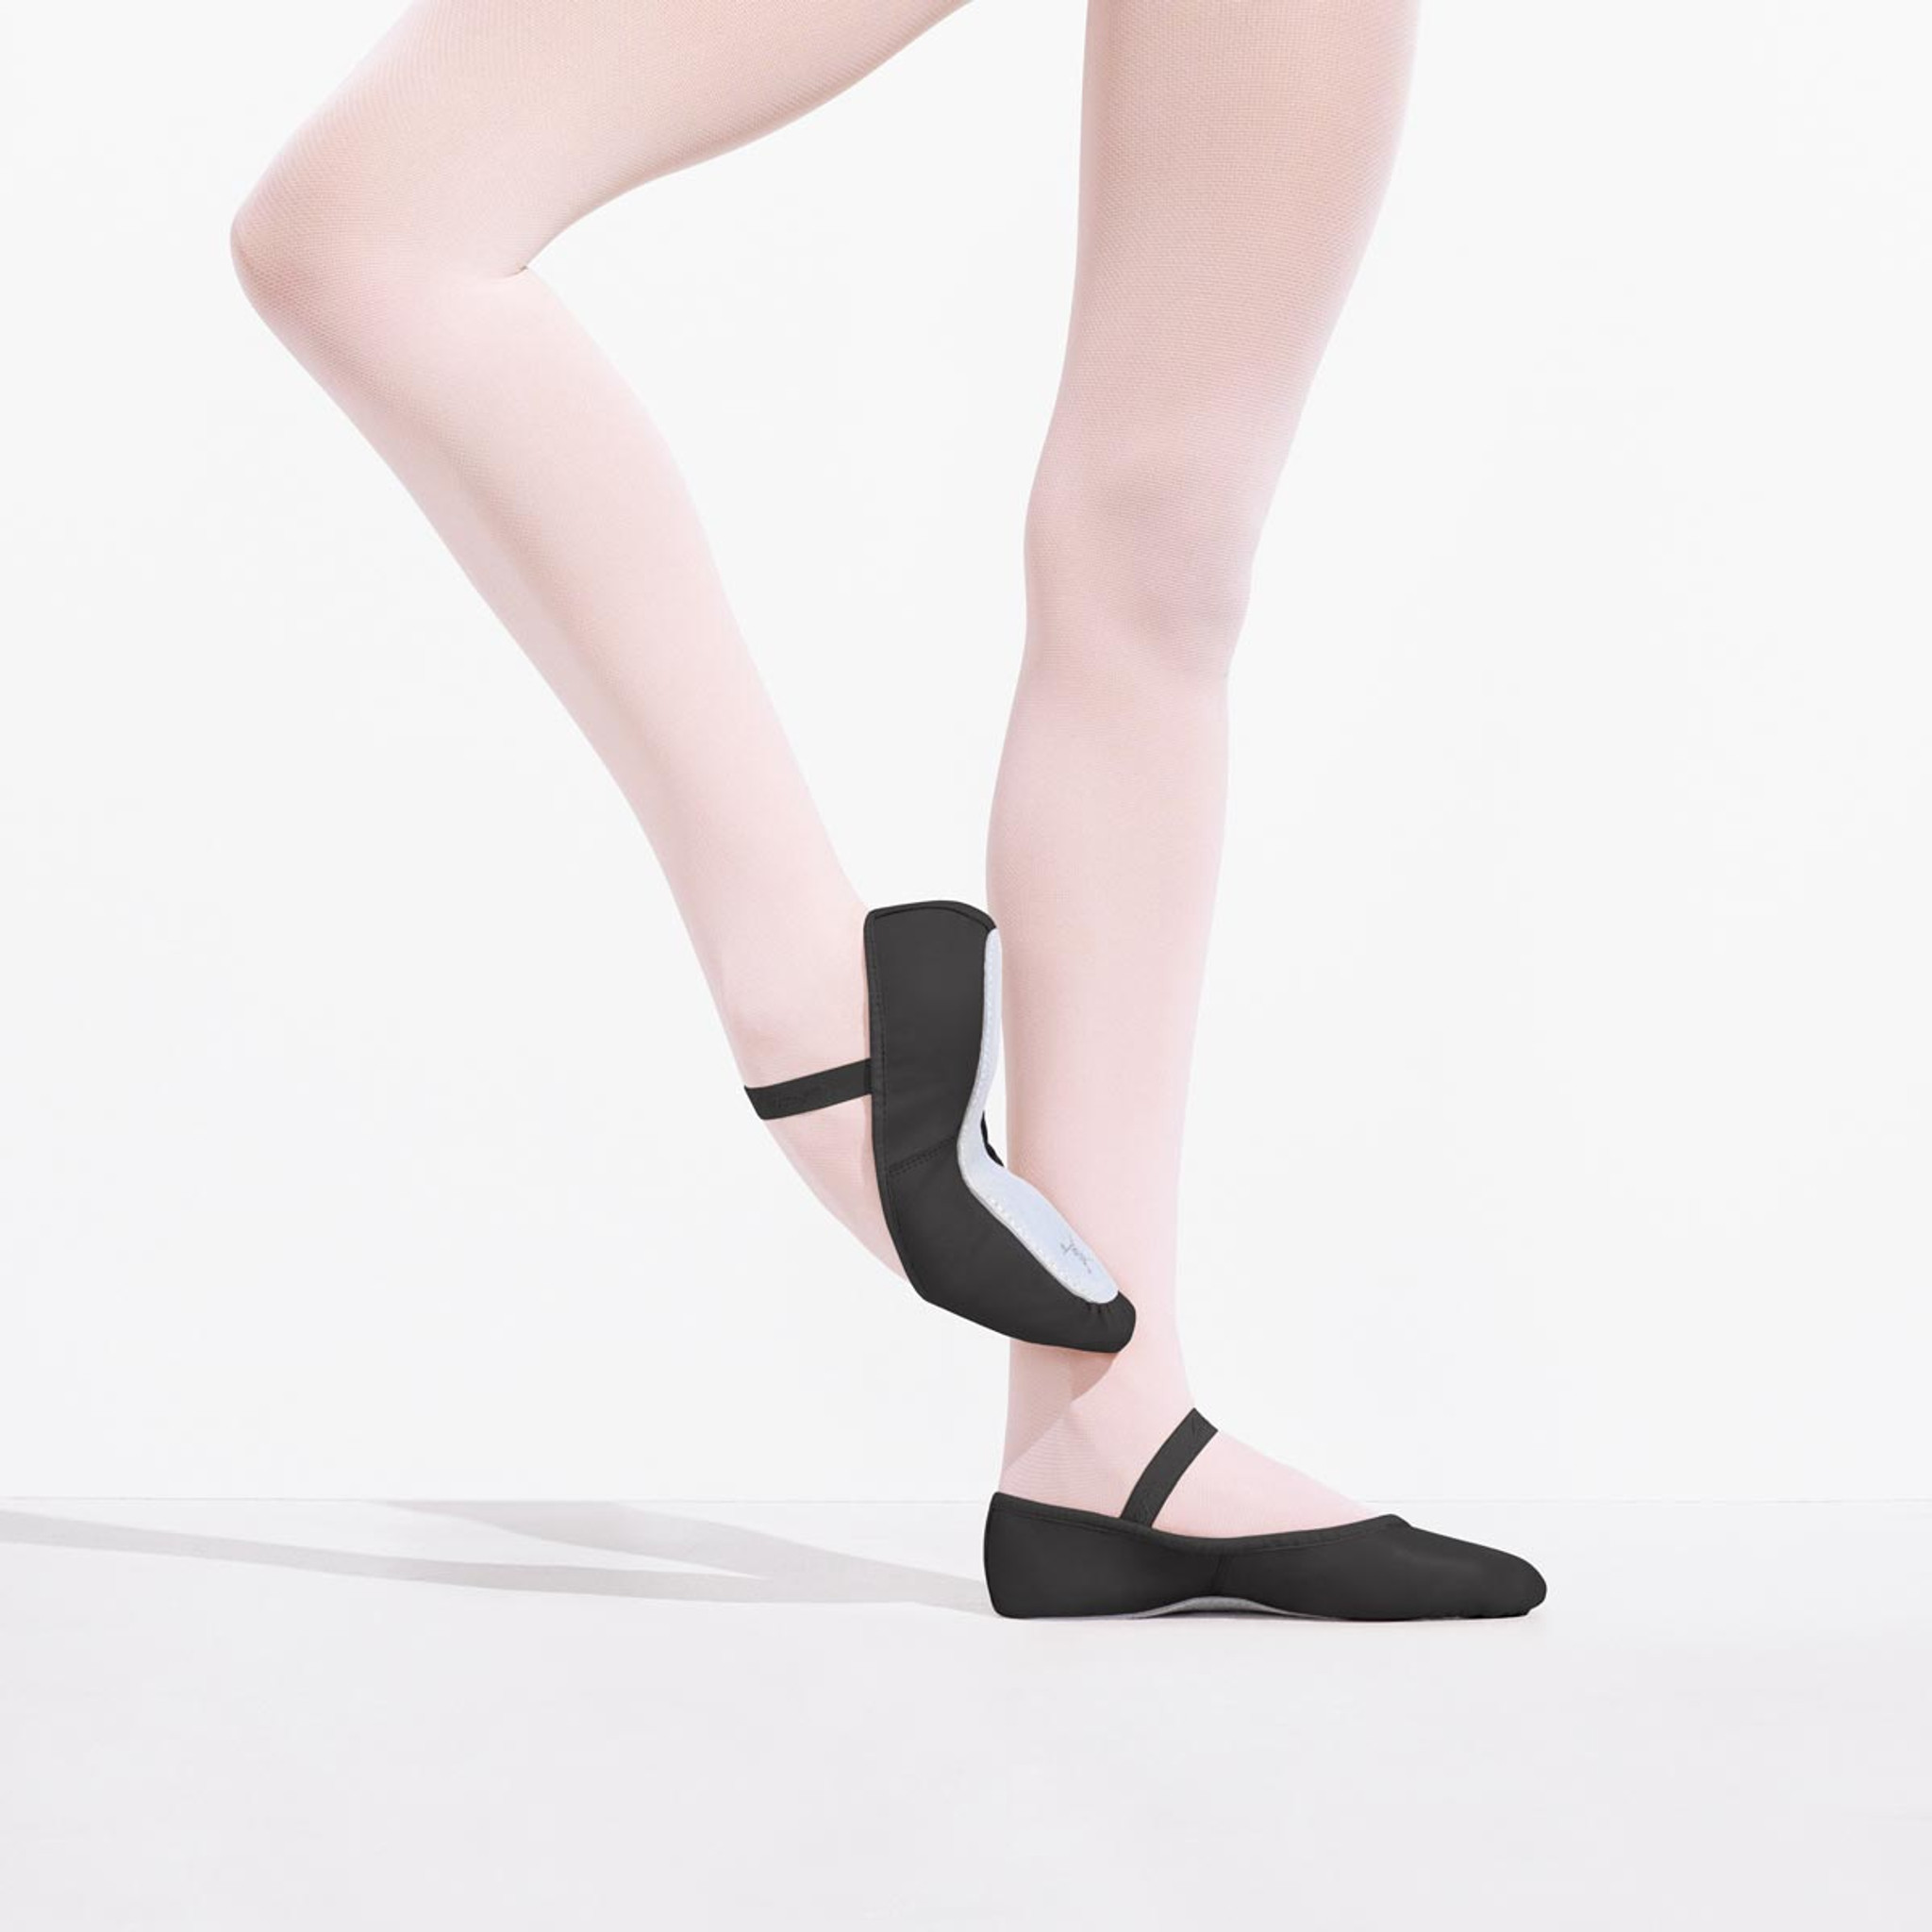 aa2f037b8e80 capezio ballet shoes black